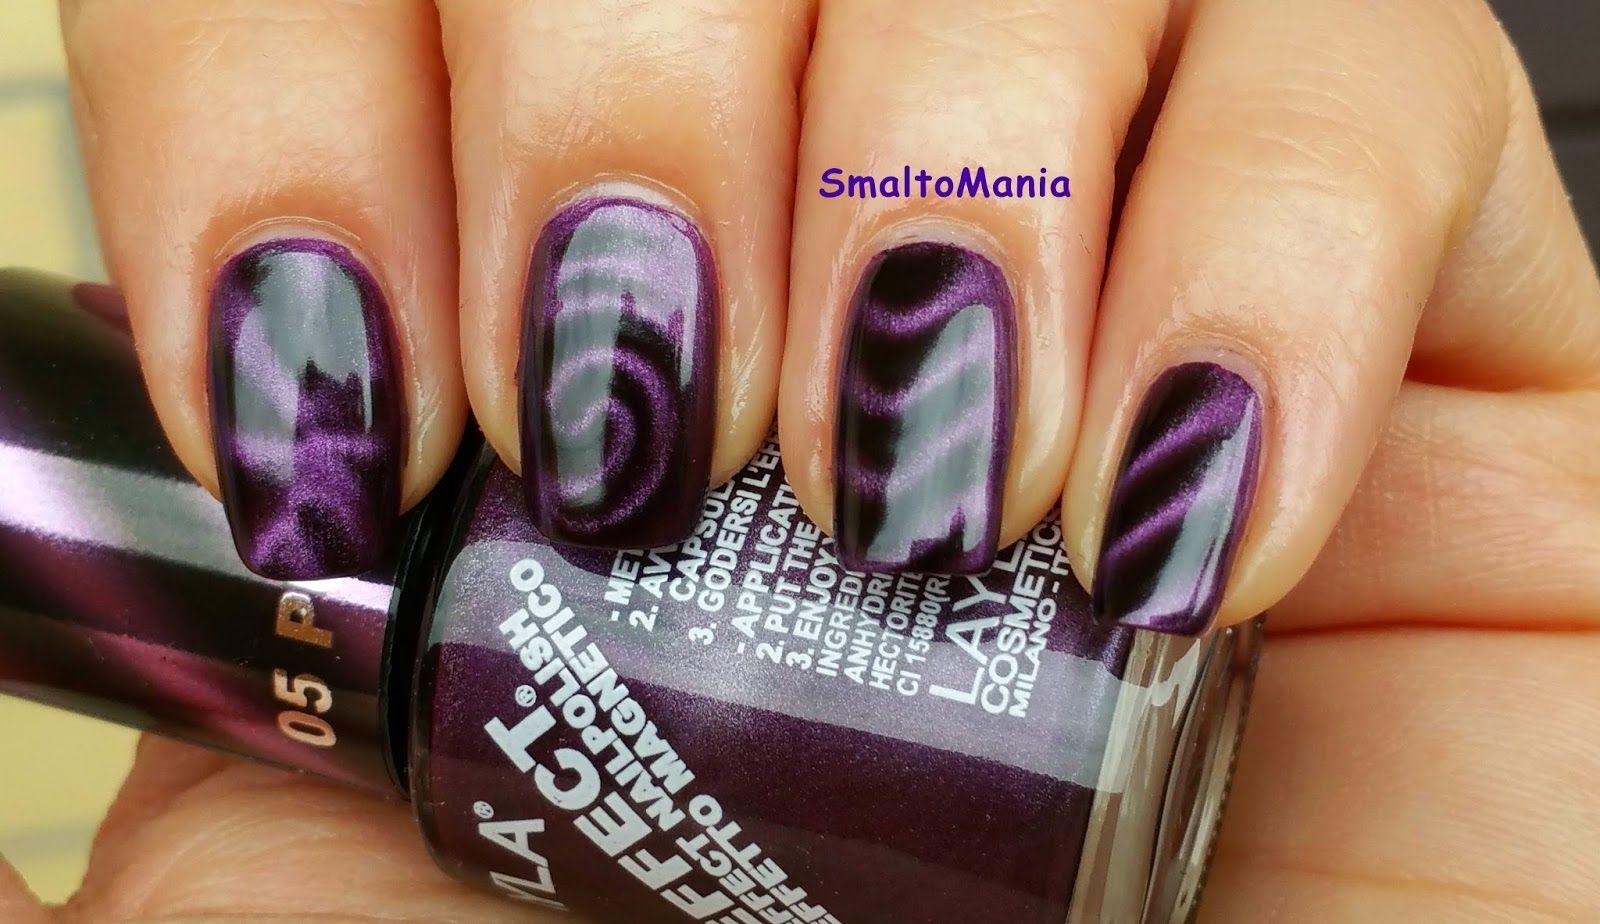 Finishpedia #17 - Magnetici: Layla Magneffect n. 05 Purple Galaxy